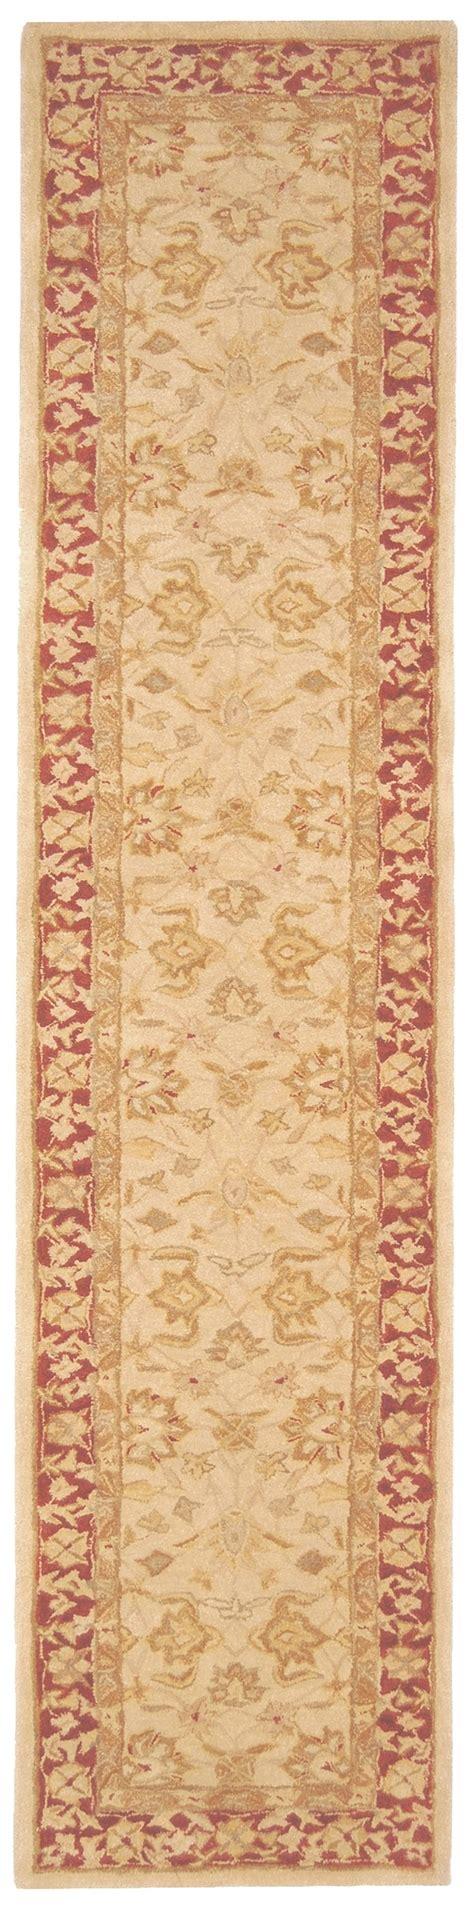 seagrass area rug safavieh anatolia an 522 rugs rugs direct 2138